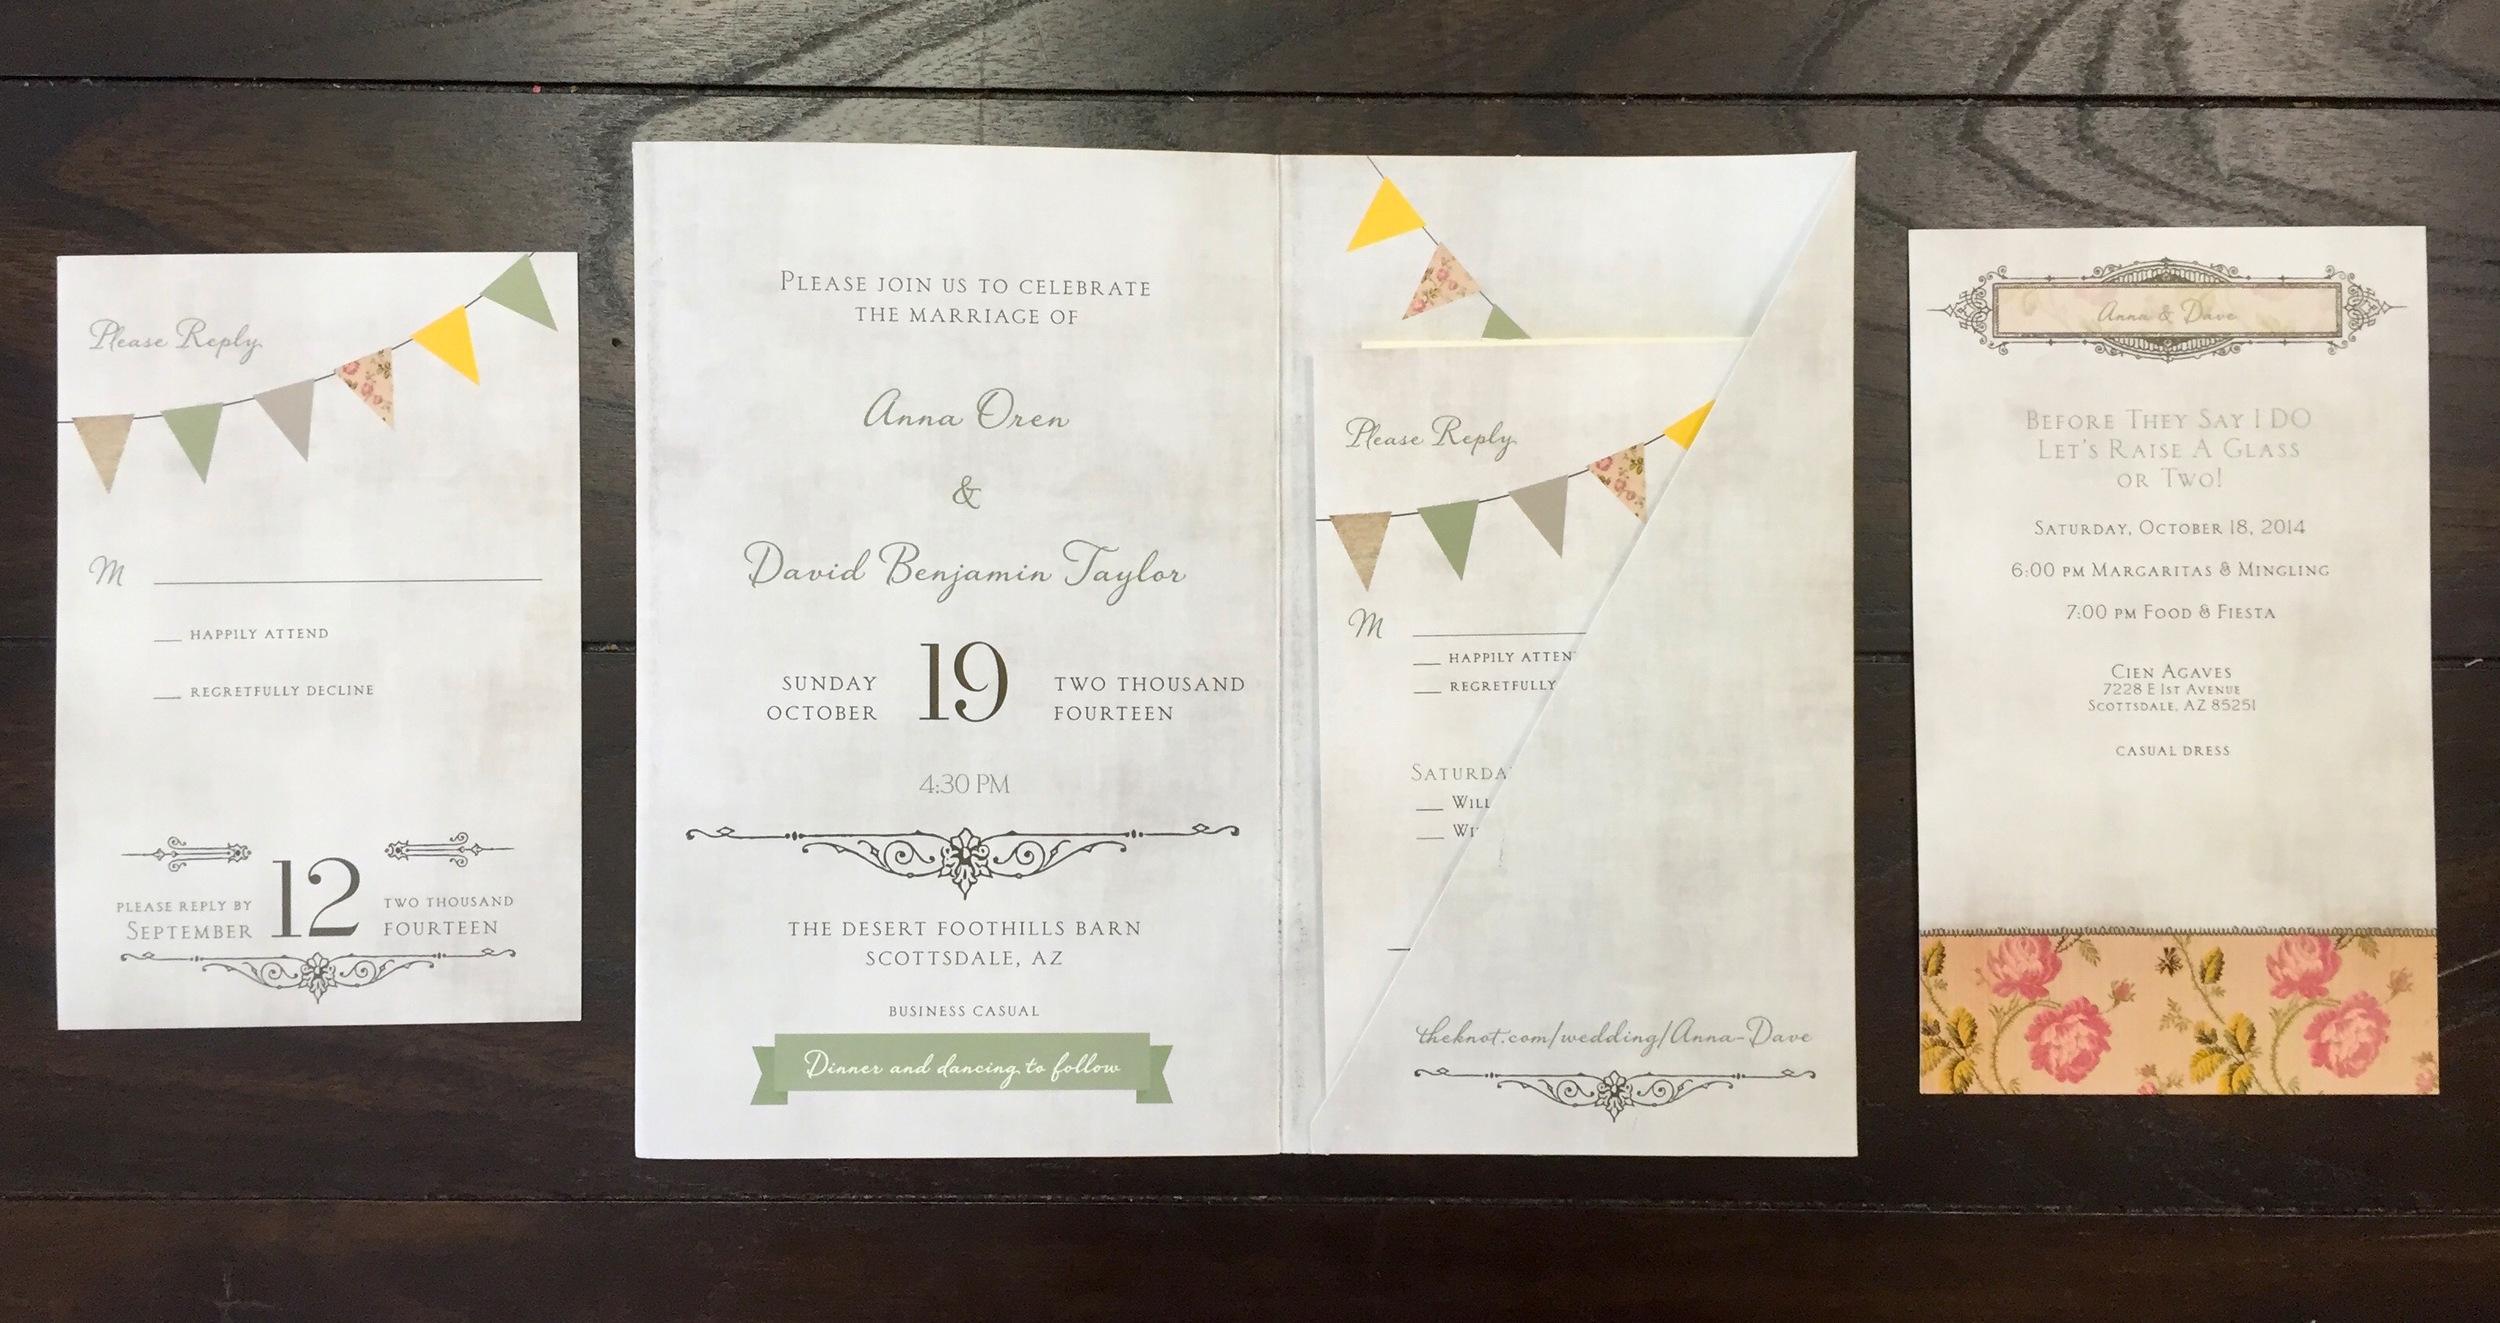 Scottsdale Wedding Invitation, Reply Card, Reception Card